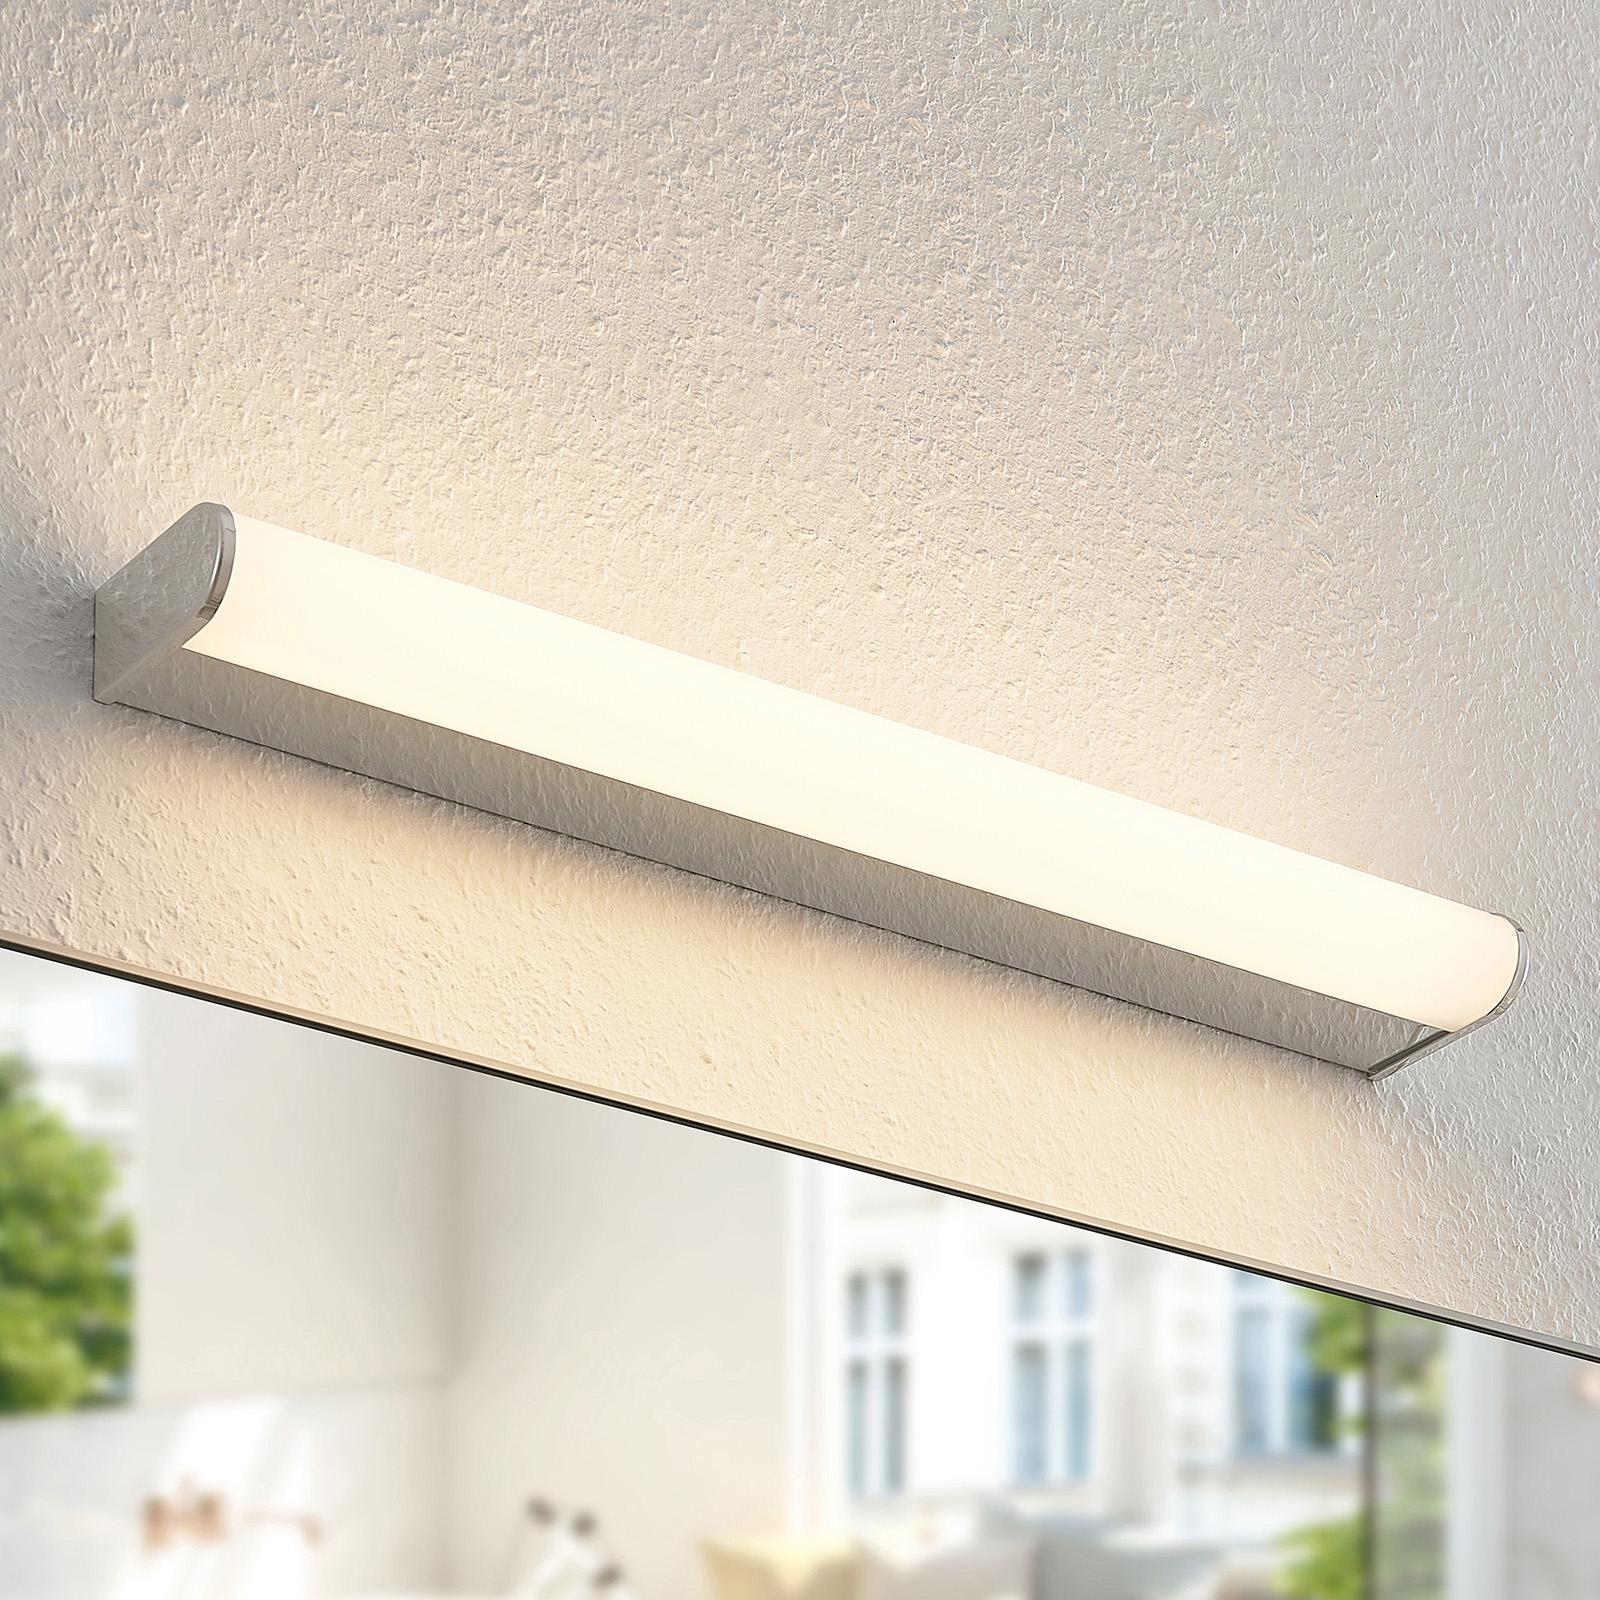 Arcchio Ecaterina kylpyhuoneen LED-lamppu, 53 cm